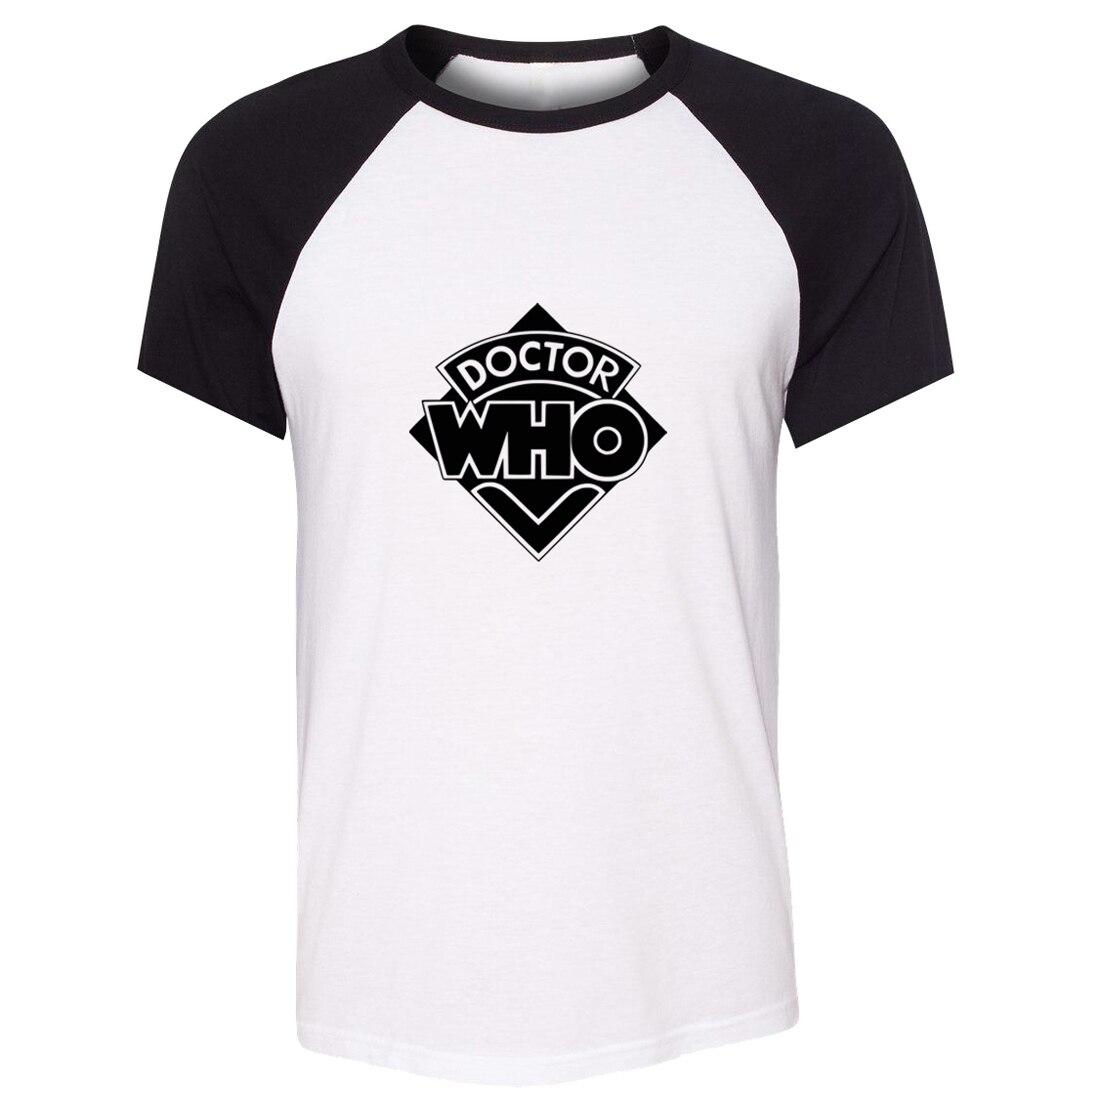 iDzn Unisex Summer Fashion T-shirt Doctor Who TV show Fans Art Pattern Design Raglan Short Sleeve Men T shirt Casual Tee Tops